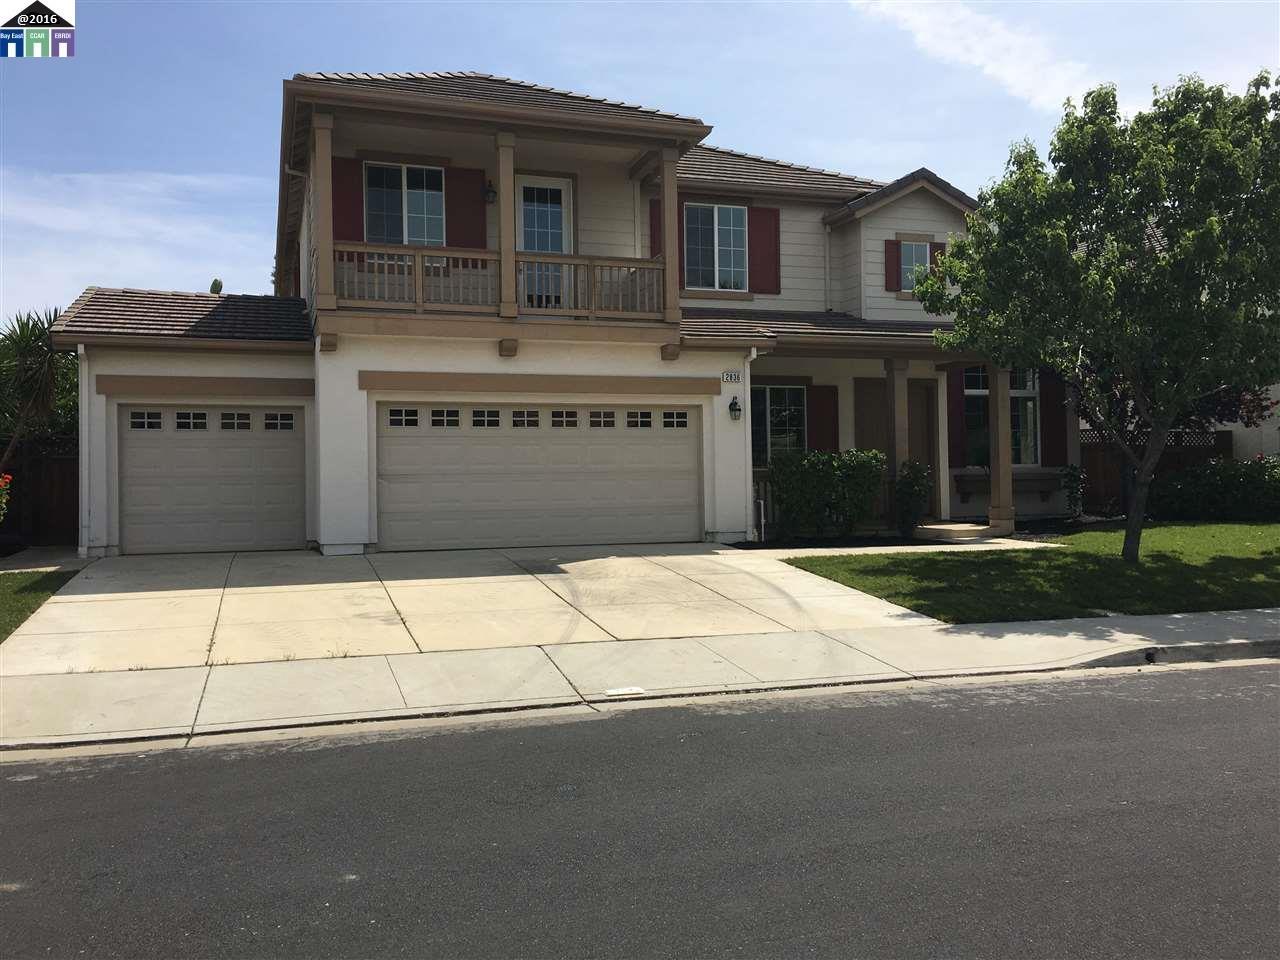 2836 Pristine Way, Brentwood, CA